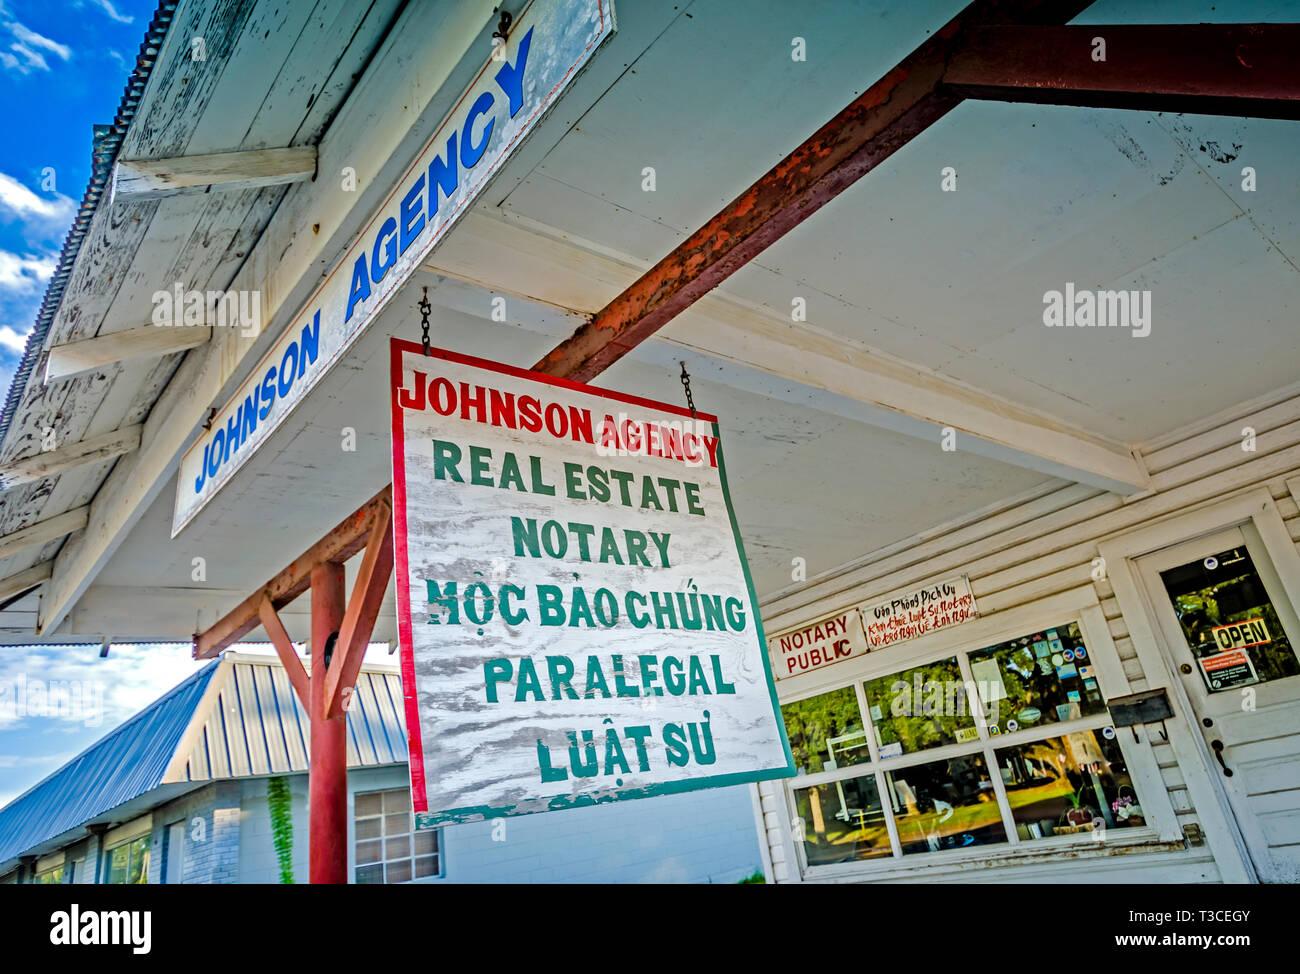 Notary Public Stock Photos & Notary Public Stock Images - Alamy